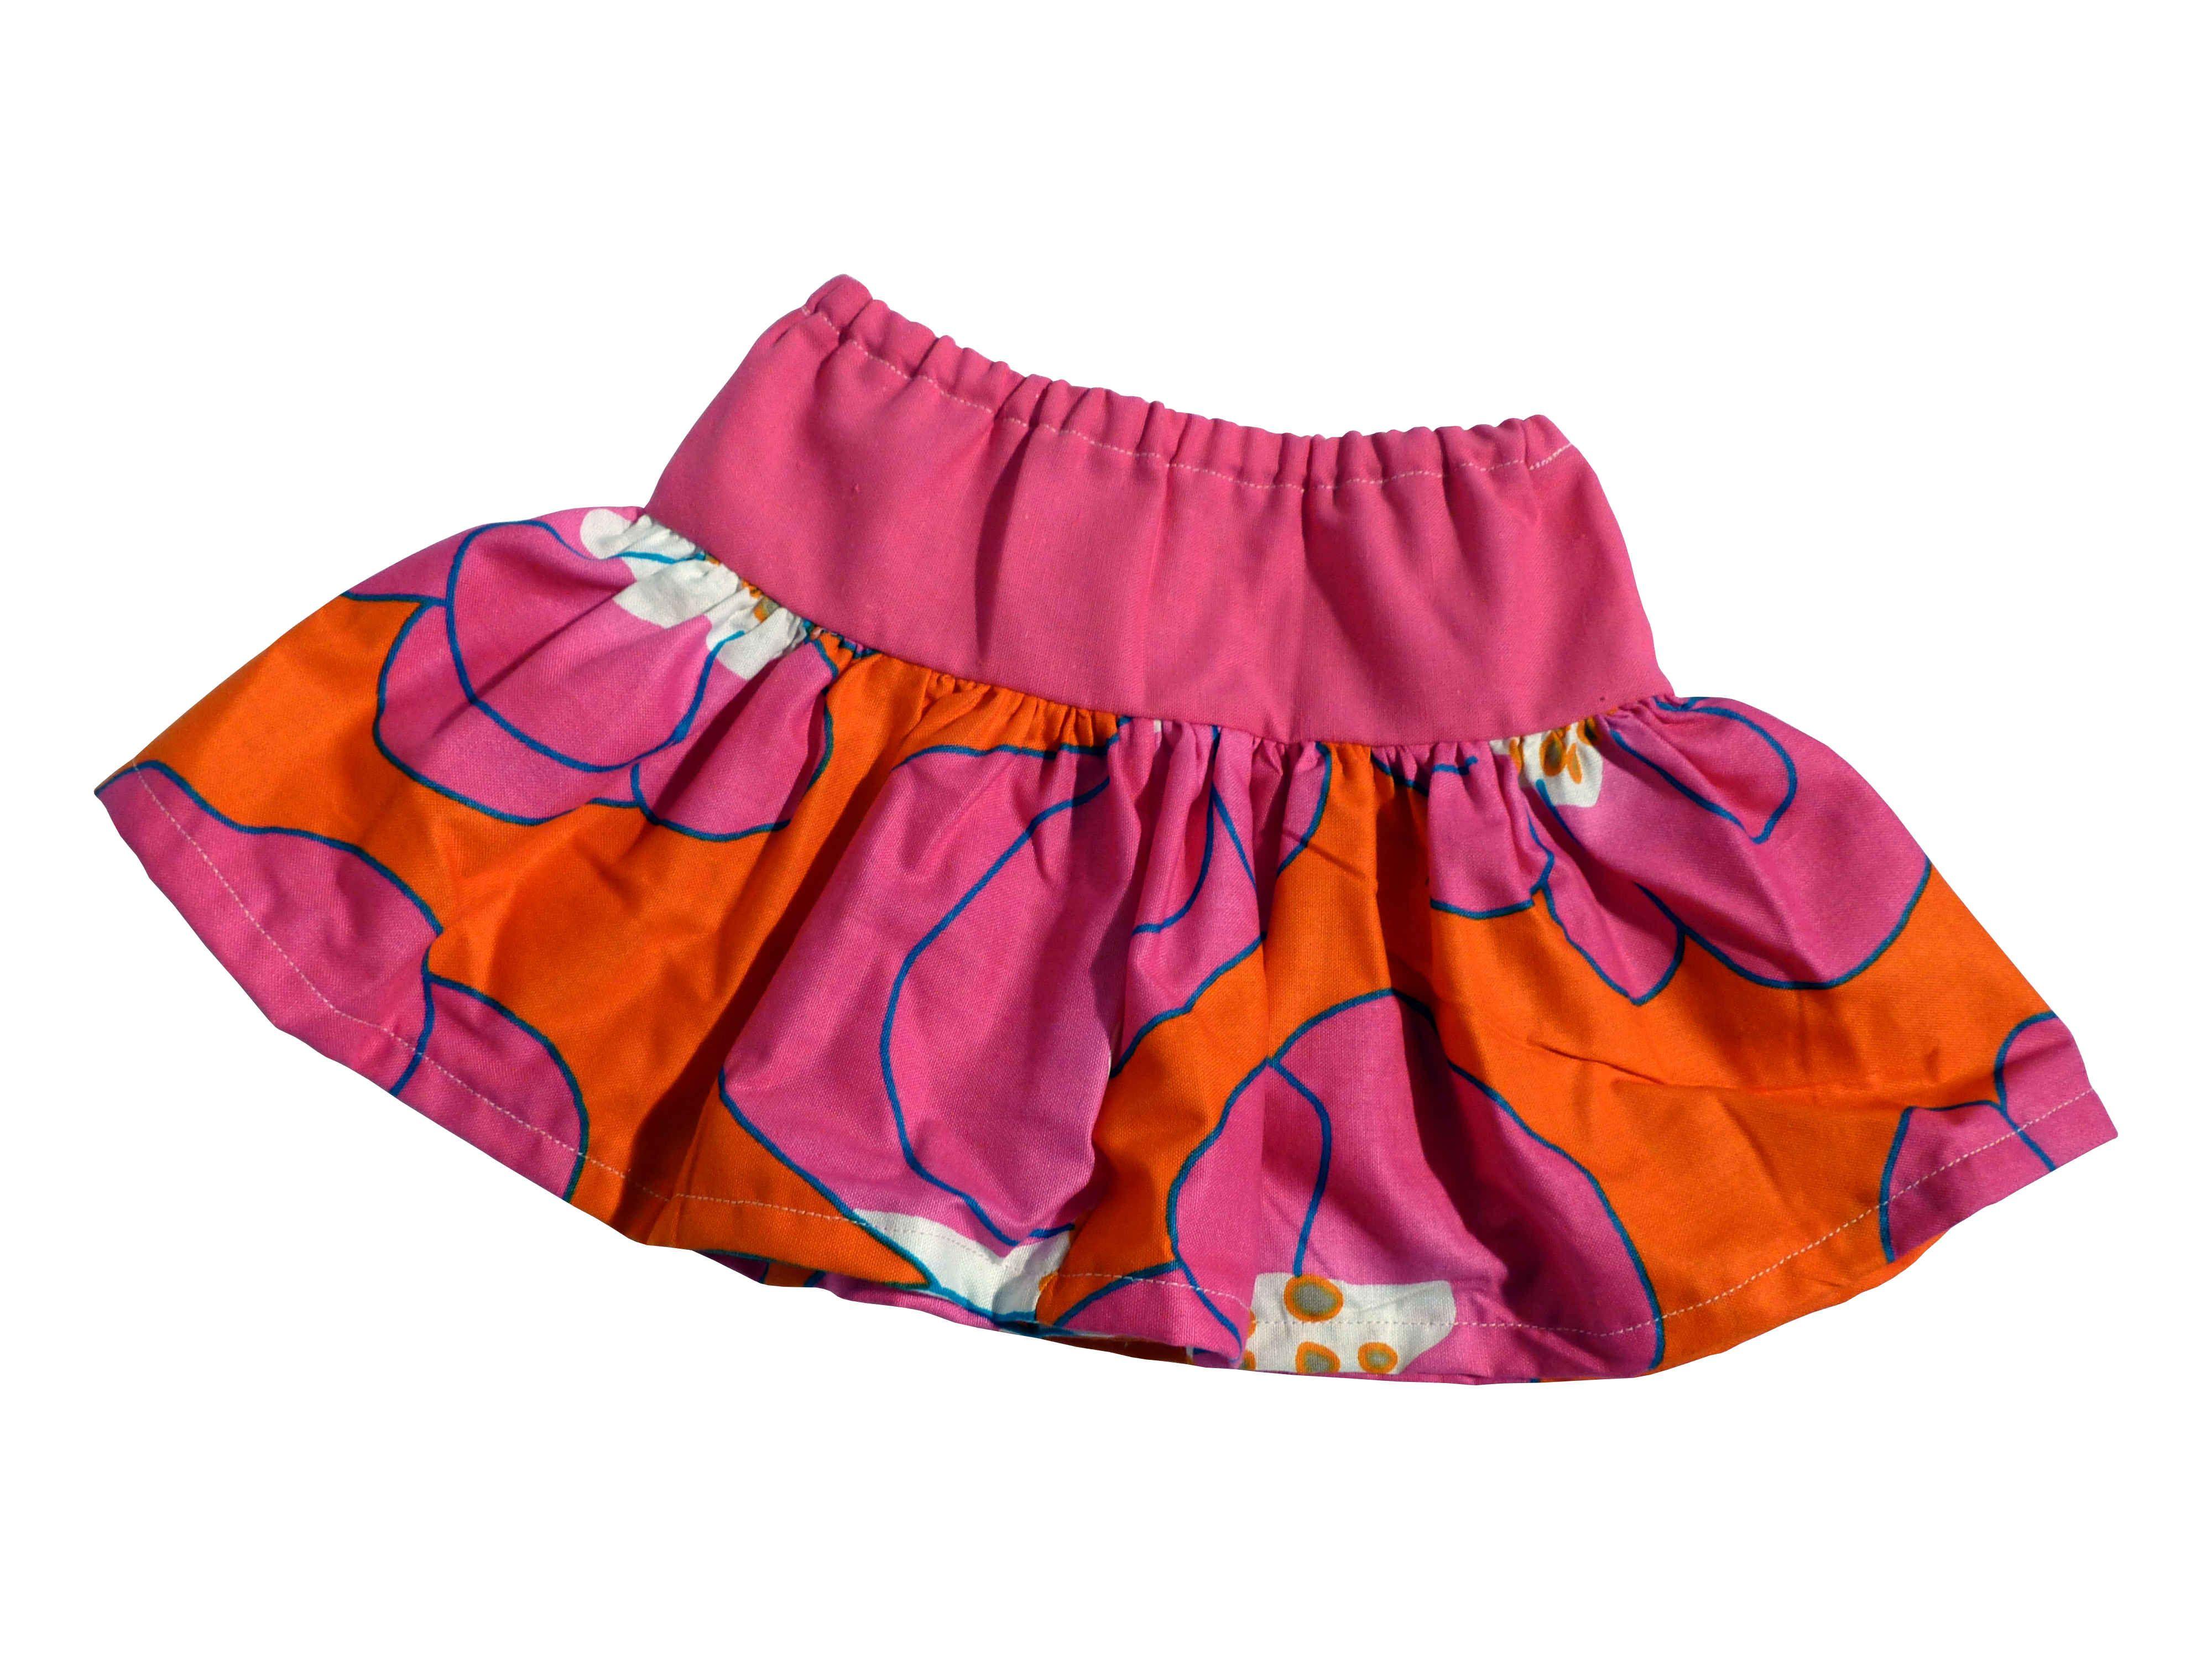 Skirt - Rock aus Stoffresten, Upcycling